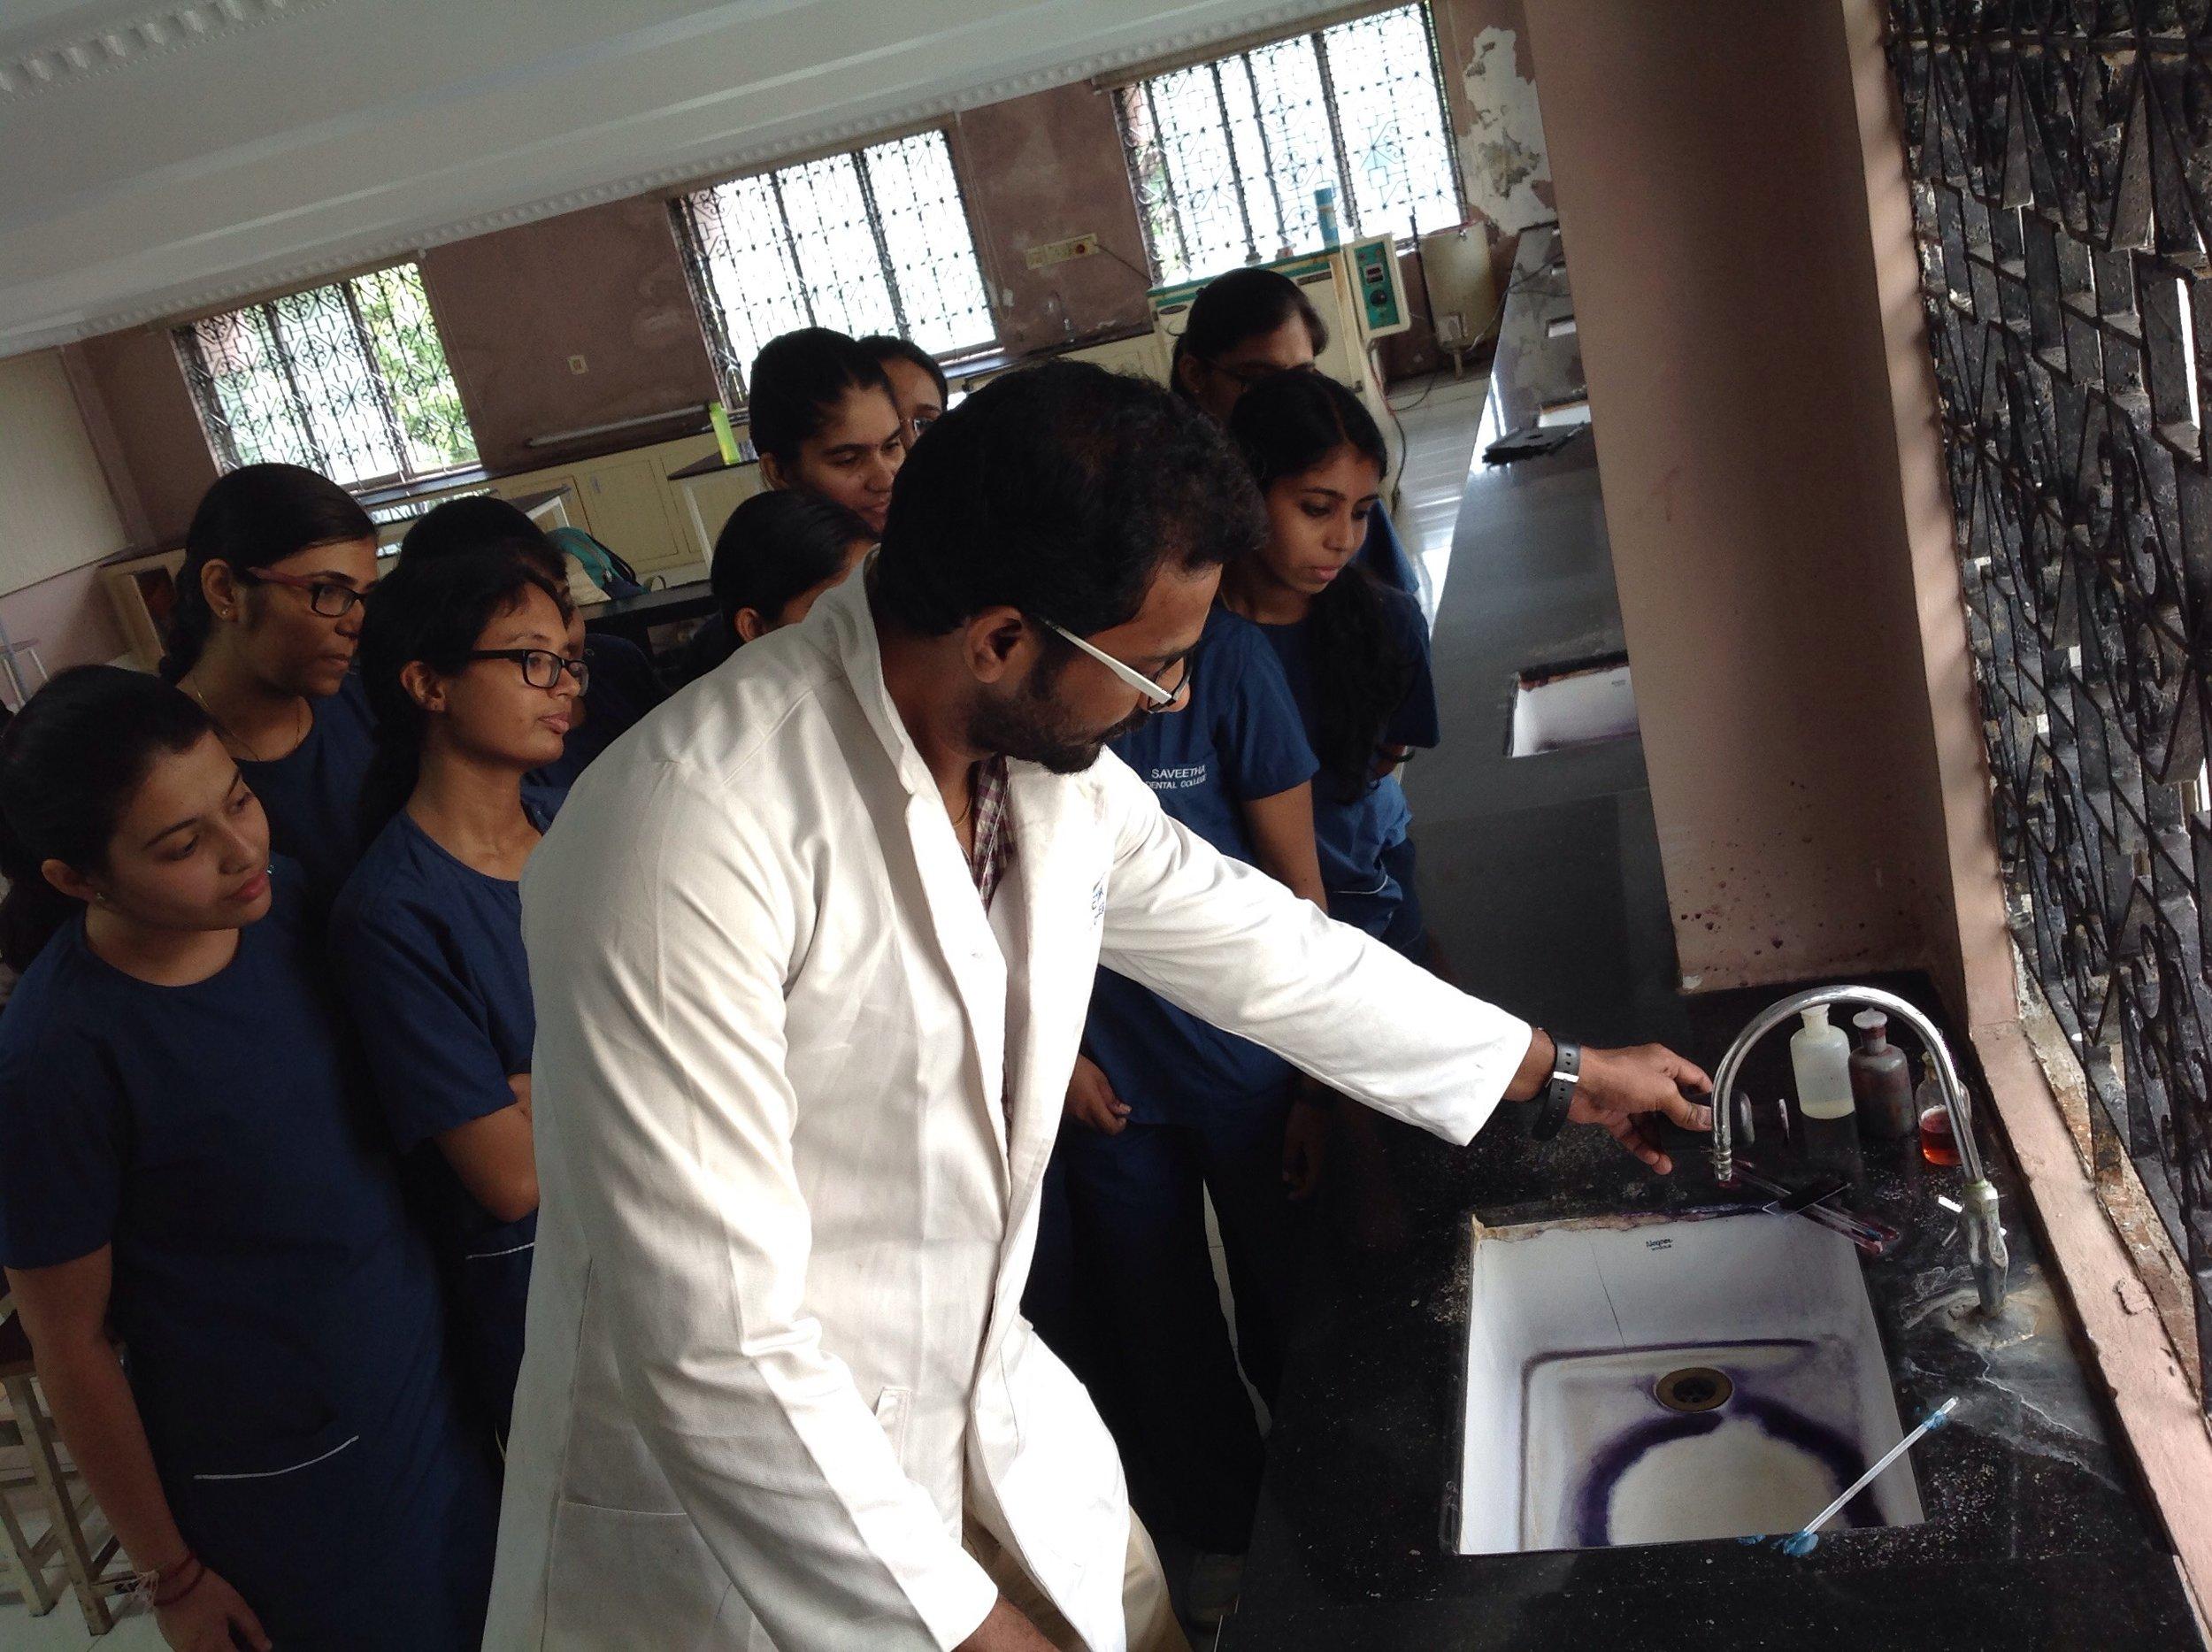 Demonstration of Grams staining